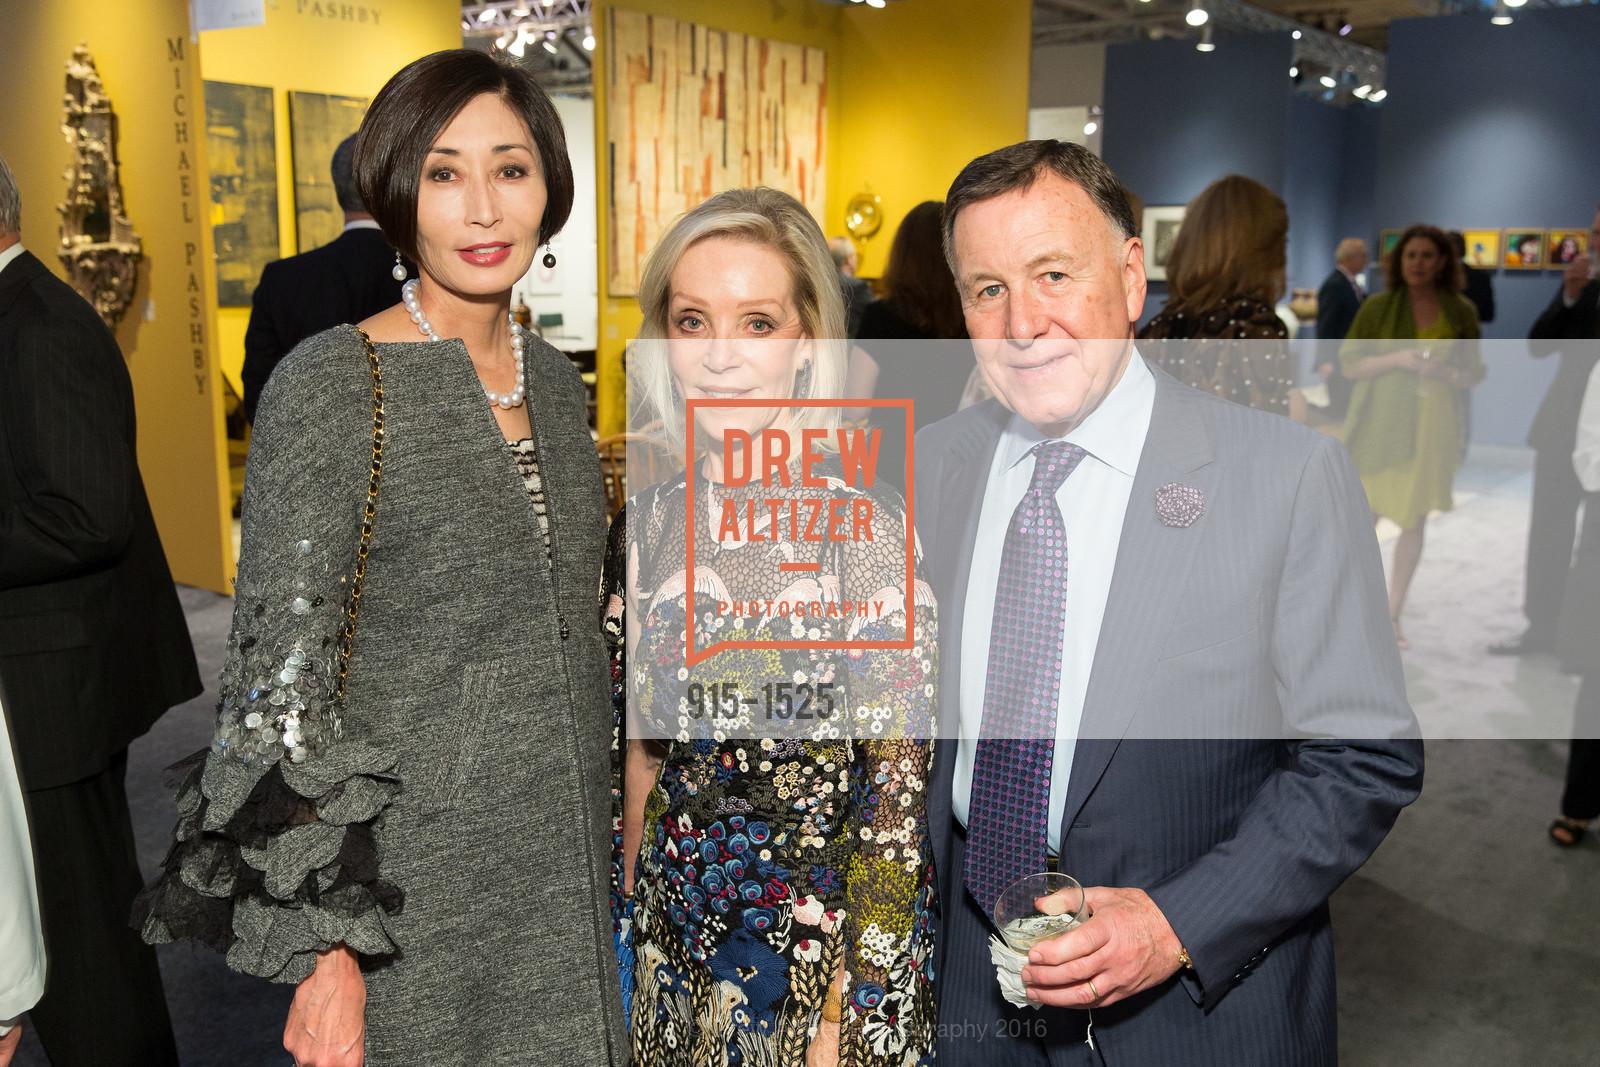 Yurie Pascarella, Barbara Brown, Carl Pascarella, Photo #915-1525